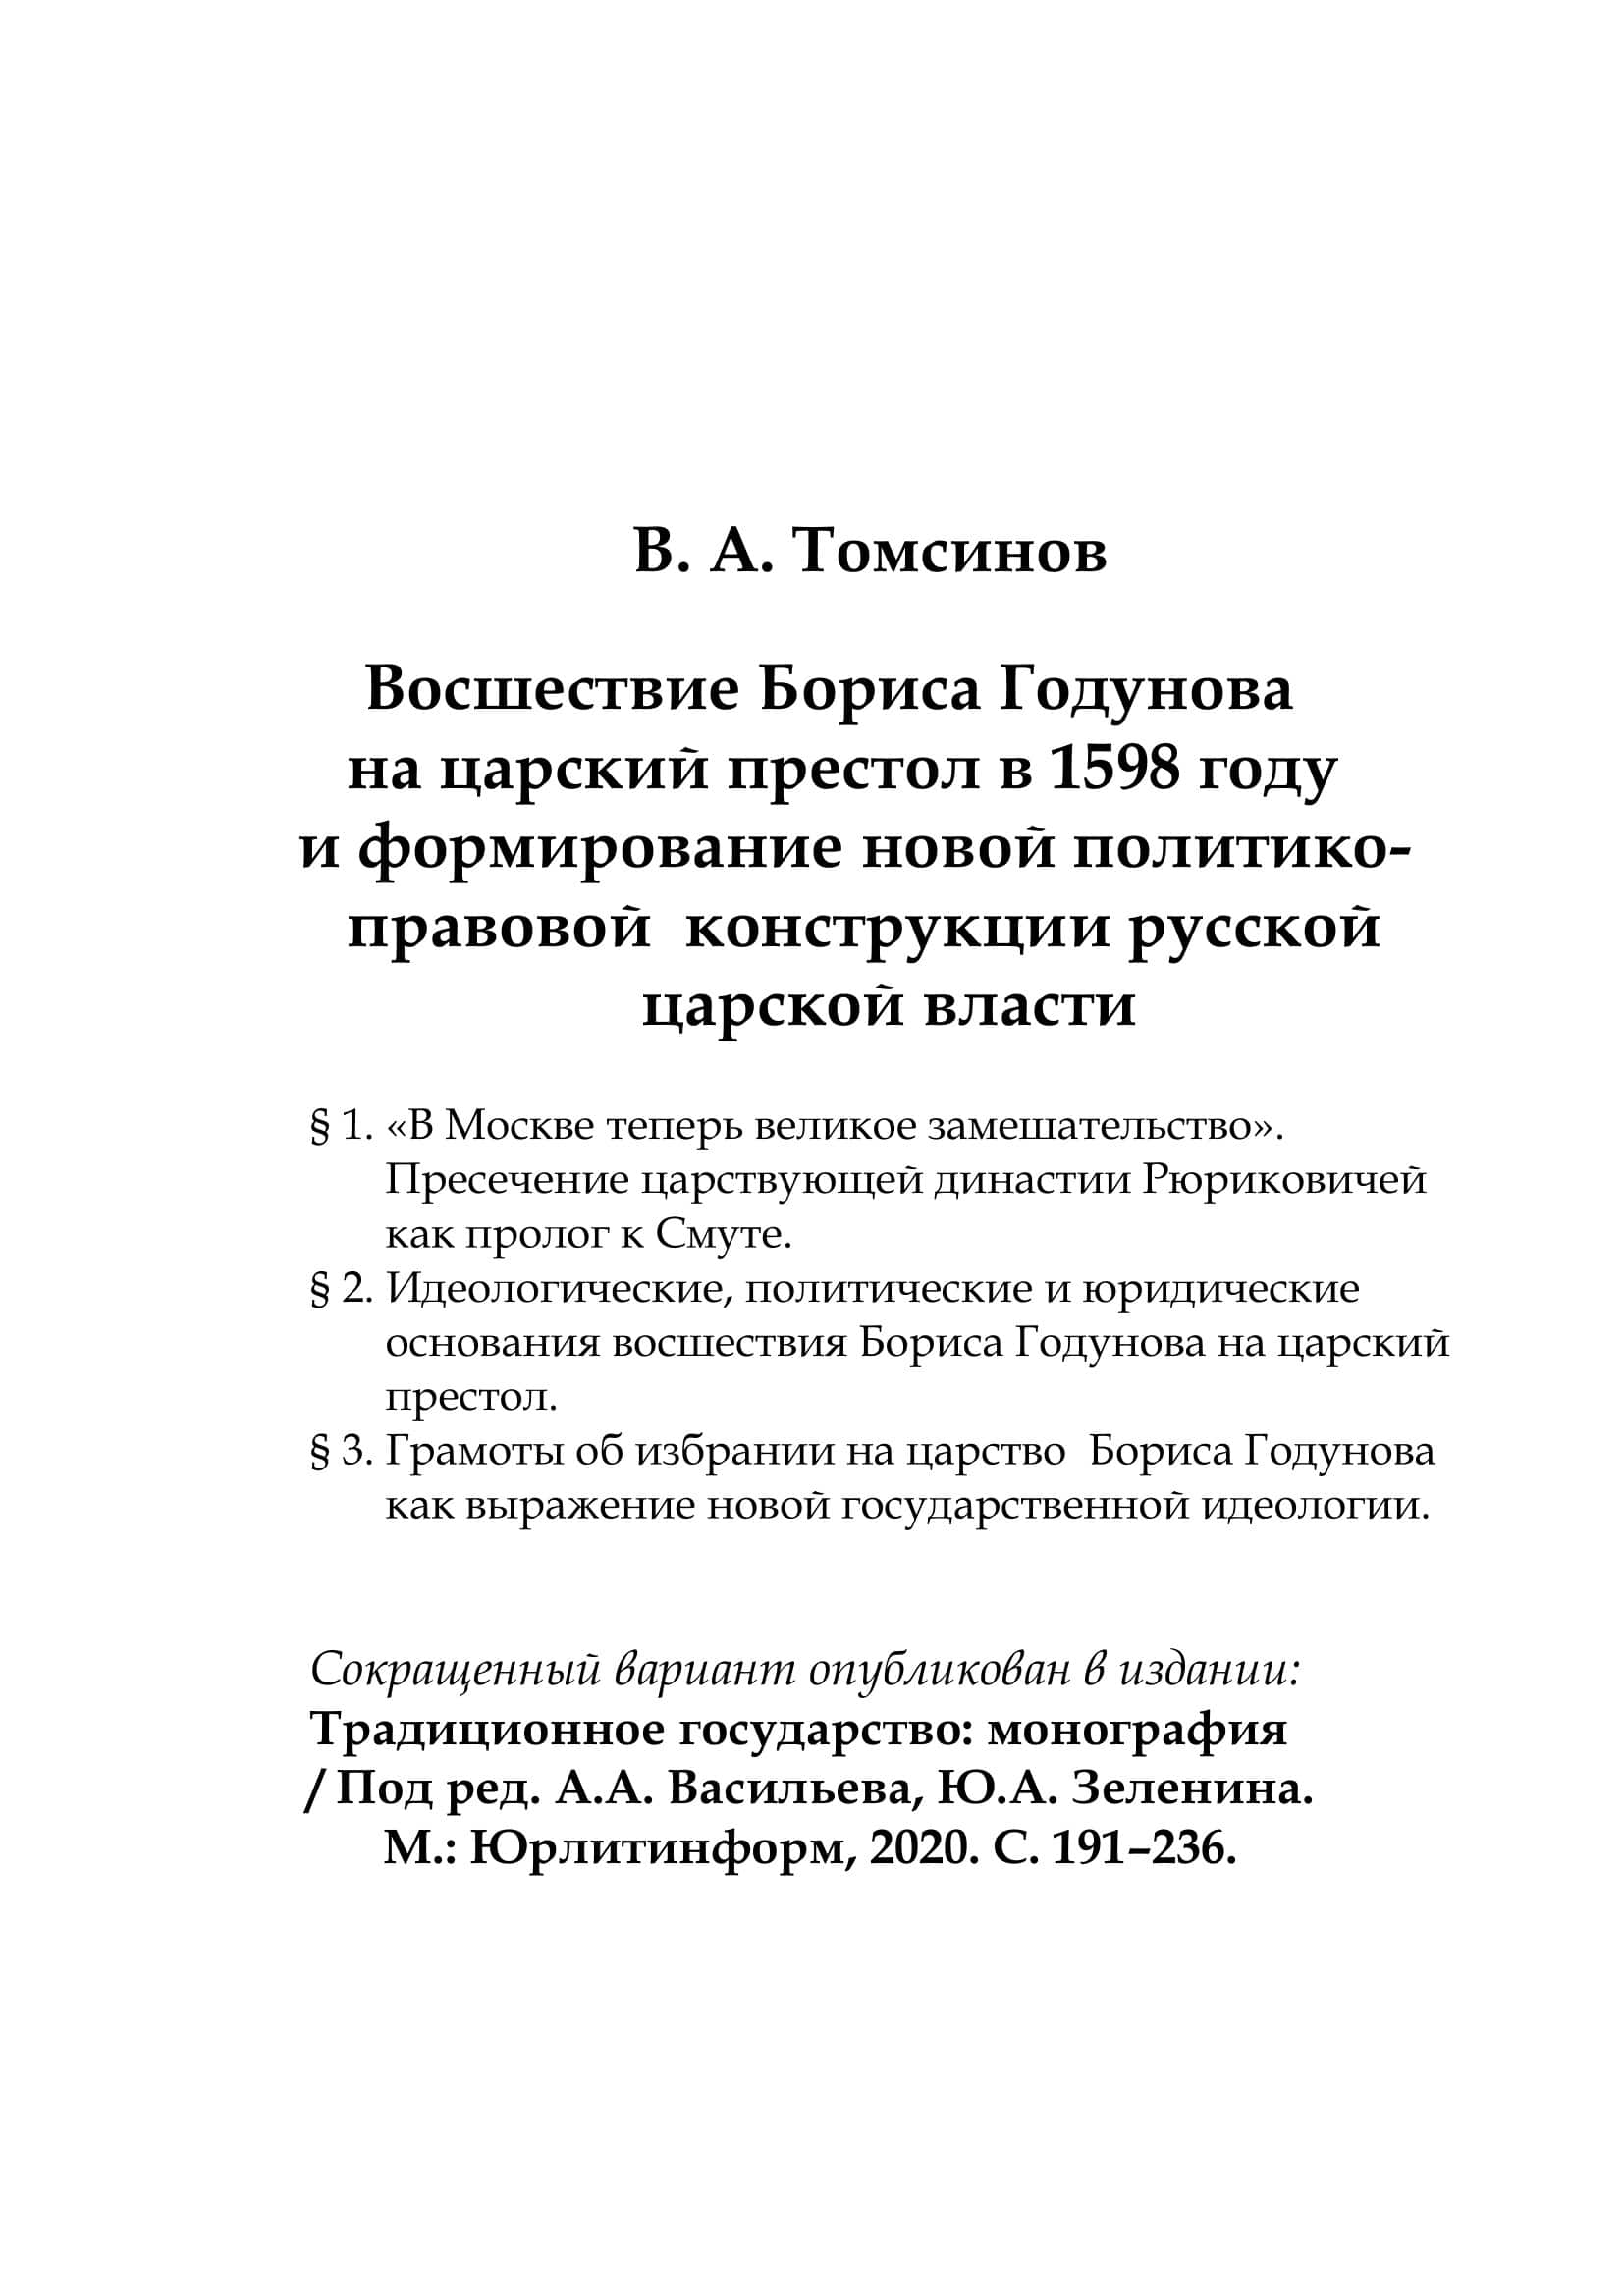 Томсинов В.А. Восшествие Бориса Годунова на царский престол